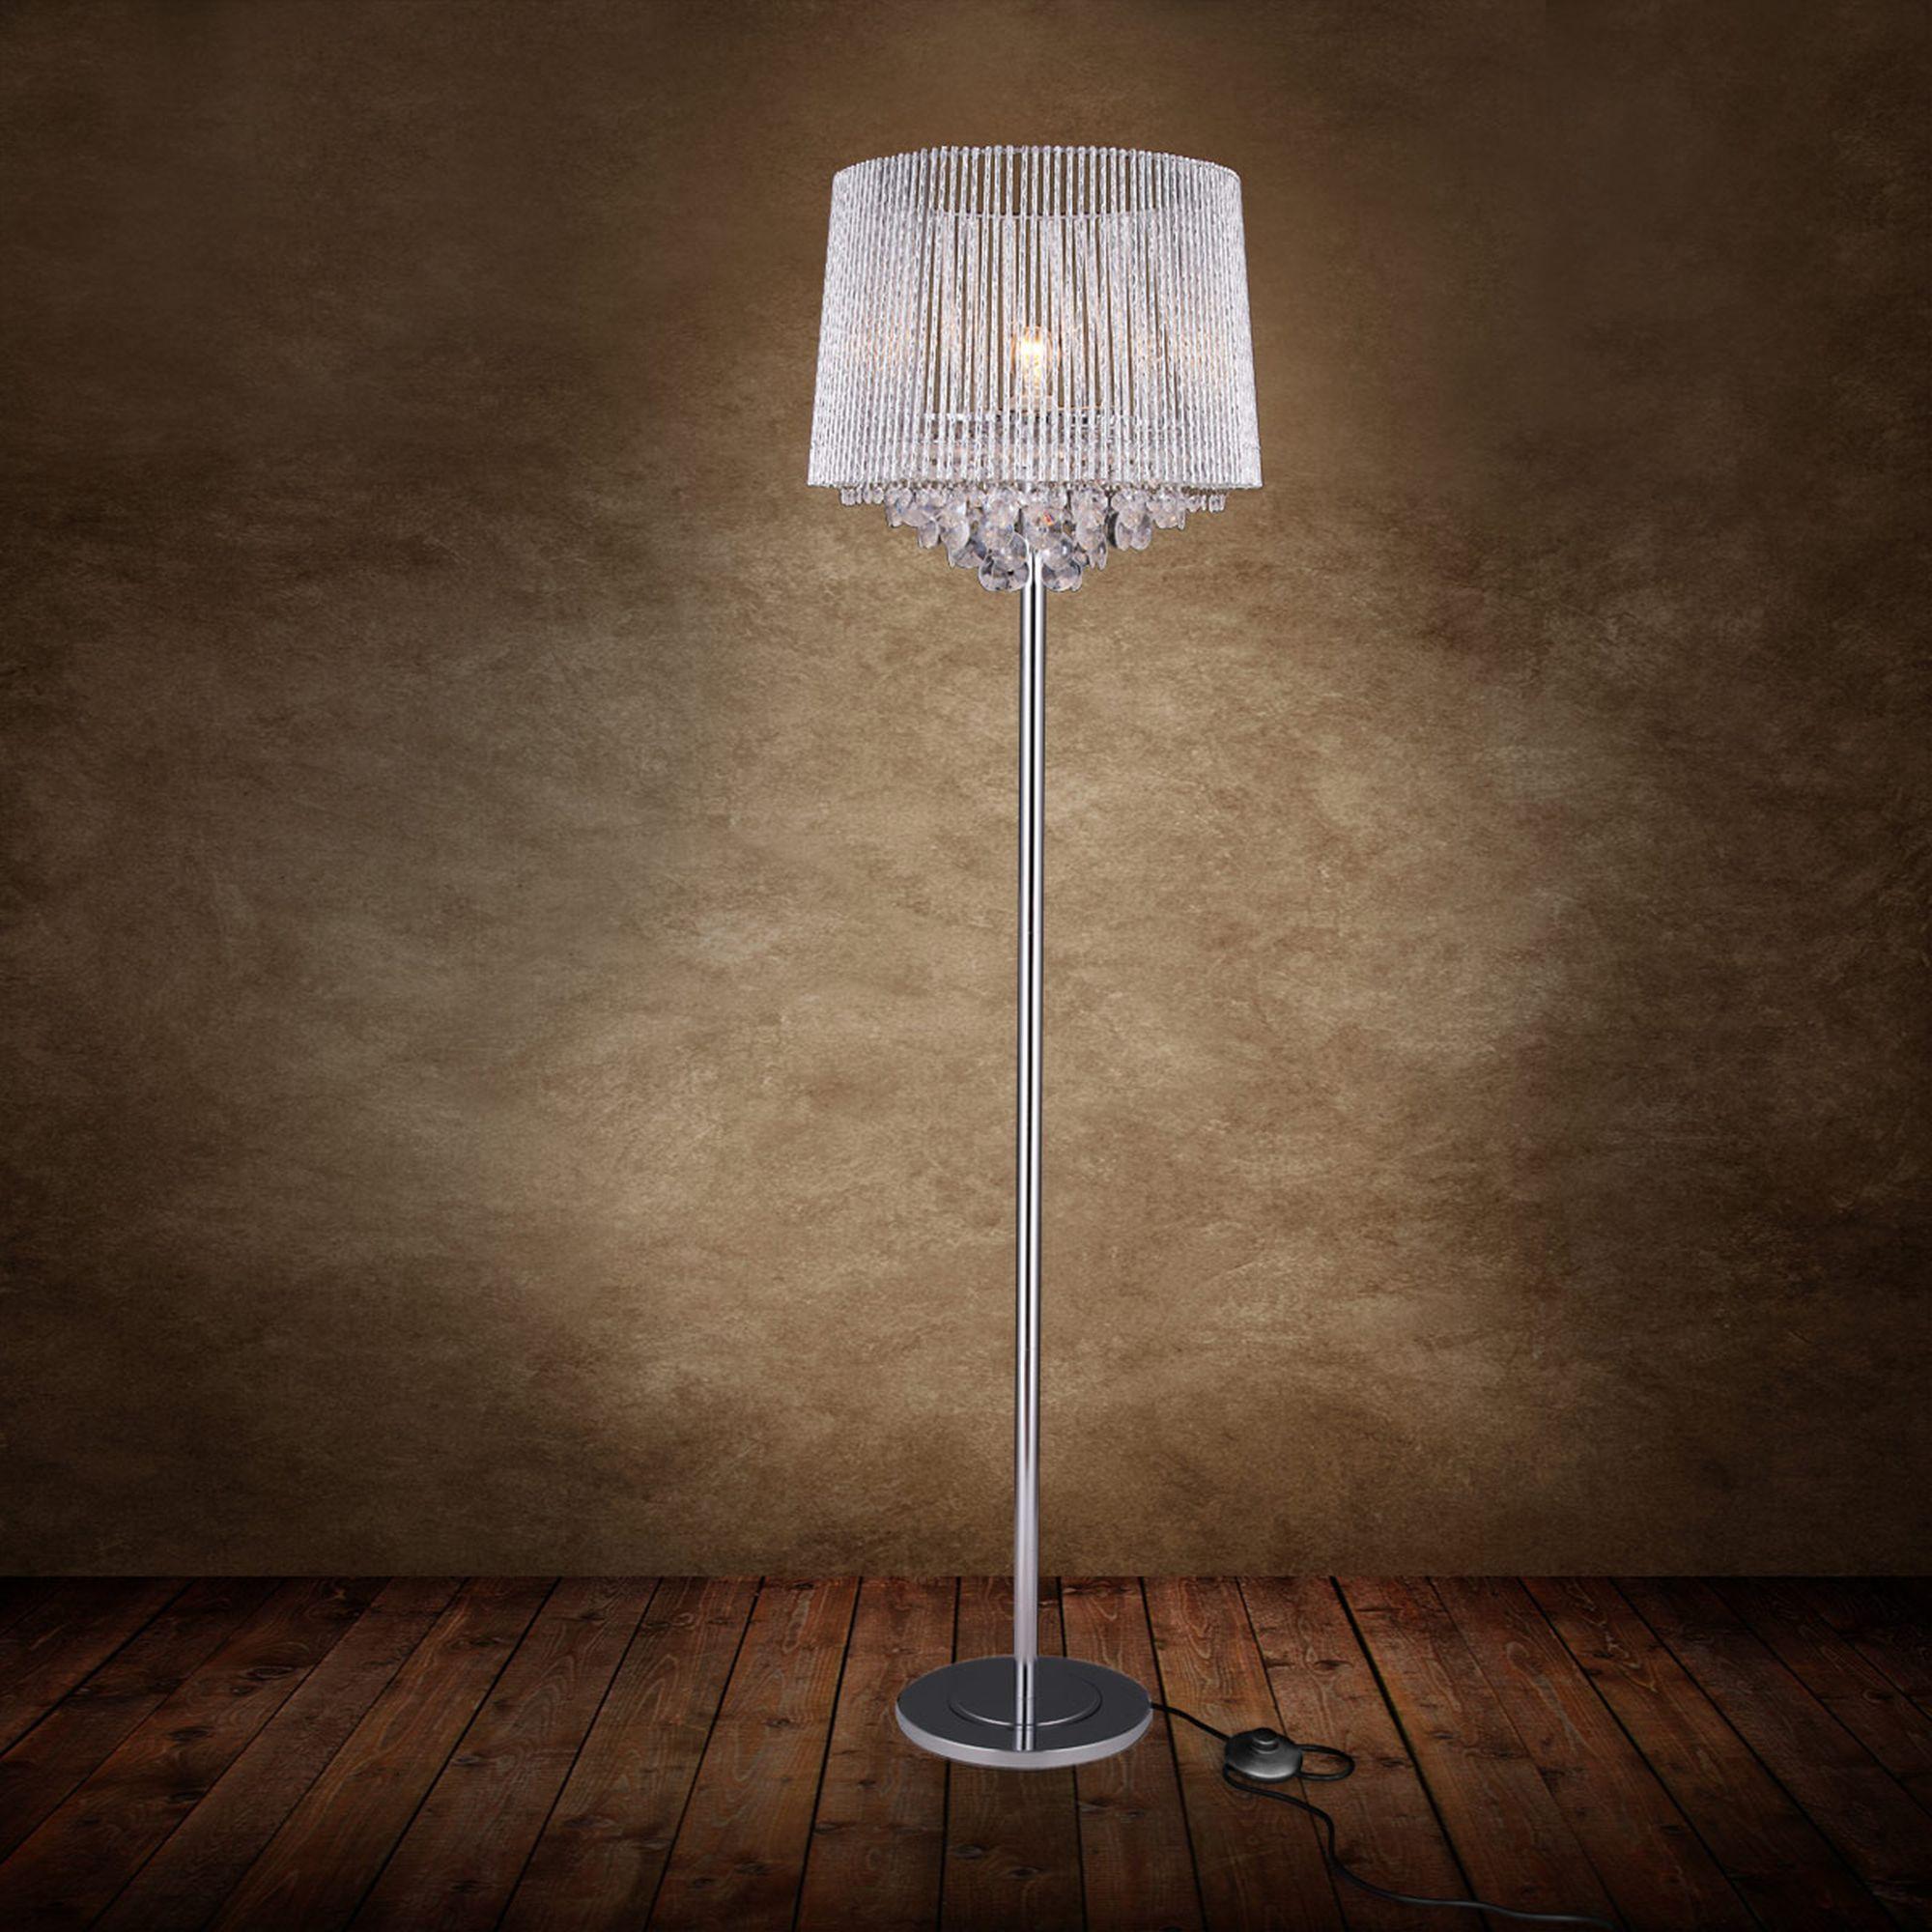 elegante luxpro kristall stehleuchte stehlampe lampe leuchte standleuchte edel ebay. Black Bedroom Furniture Sets. Home Design Ideas